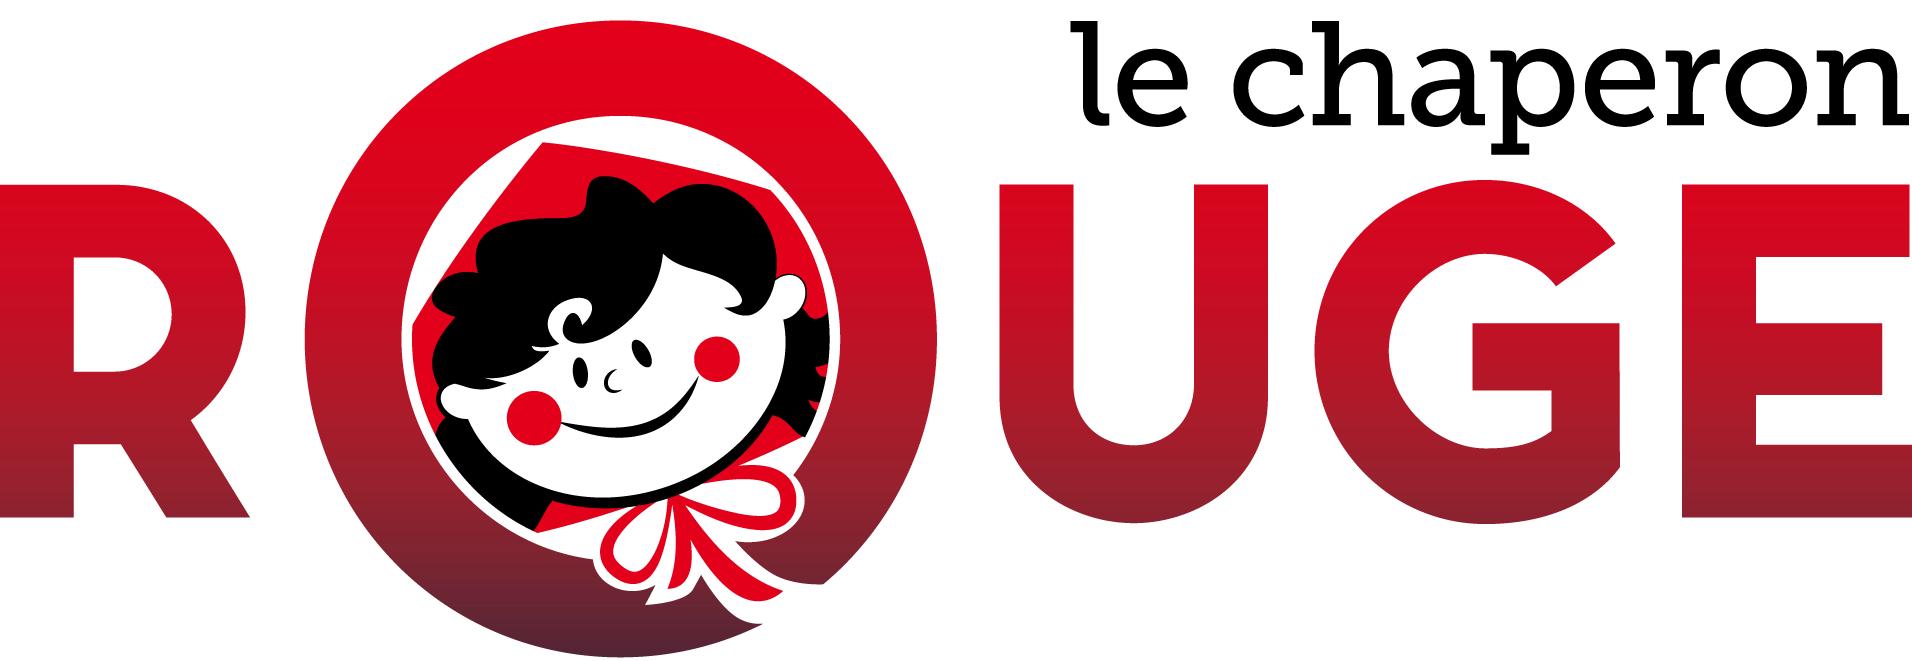 lcr_3_logo